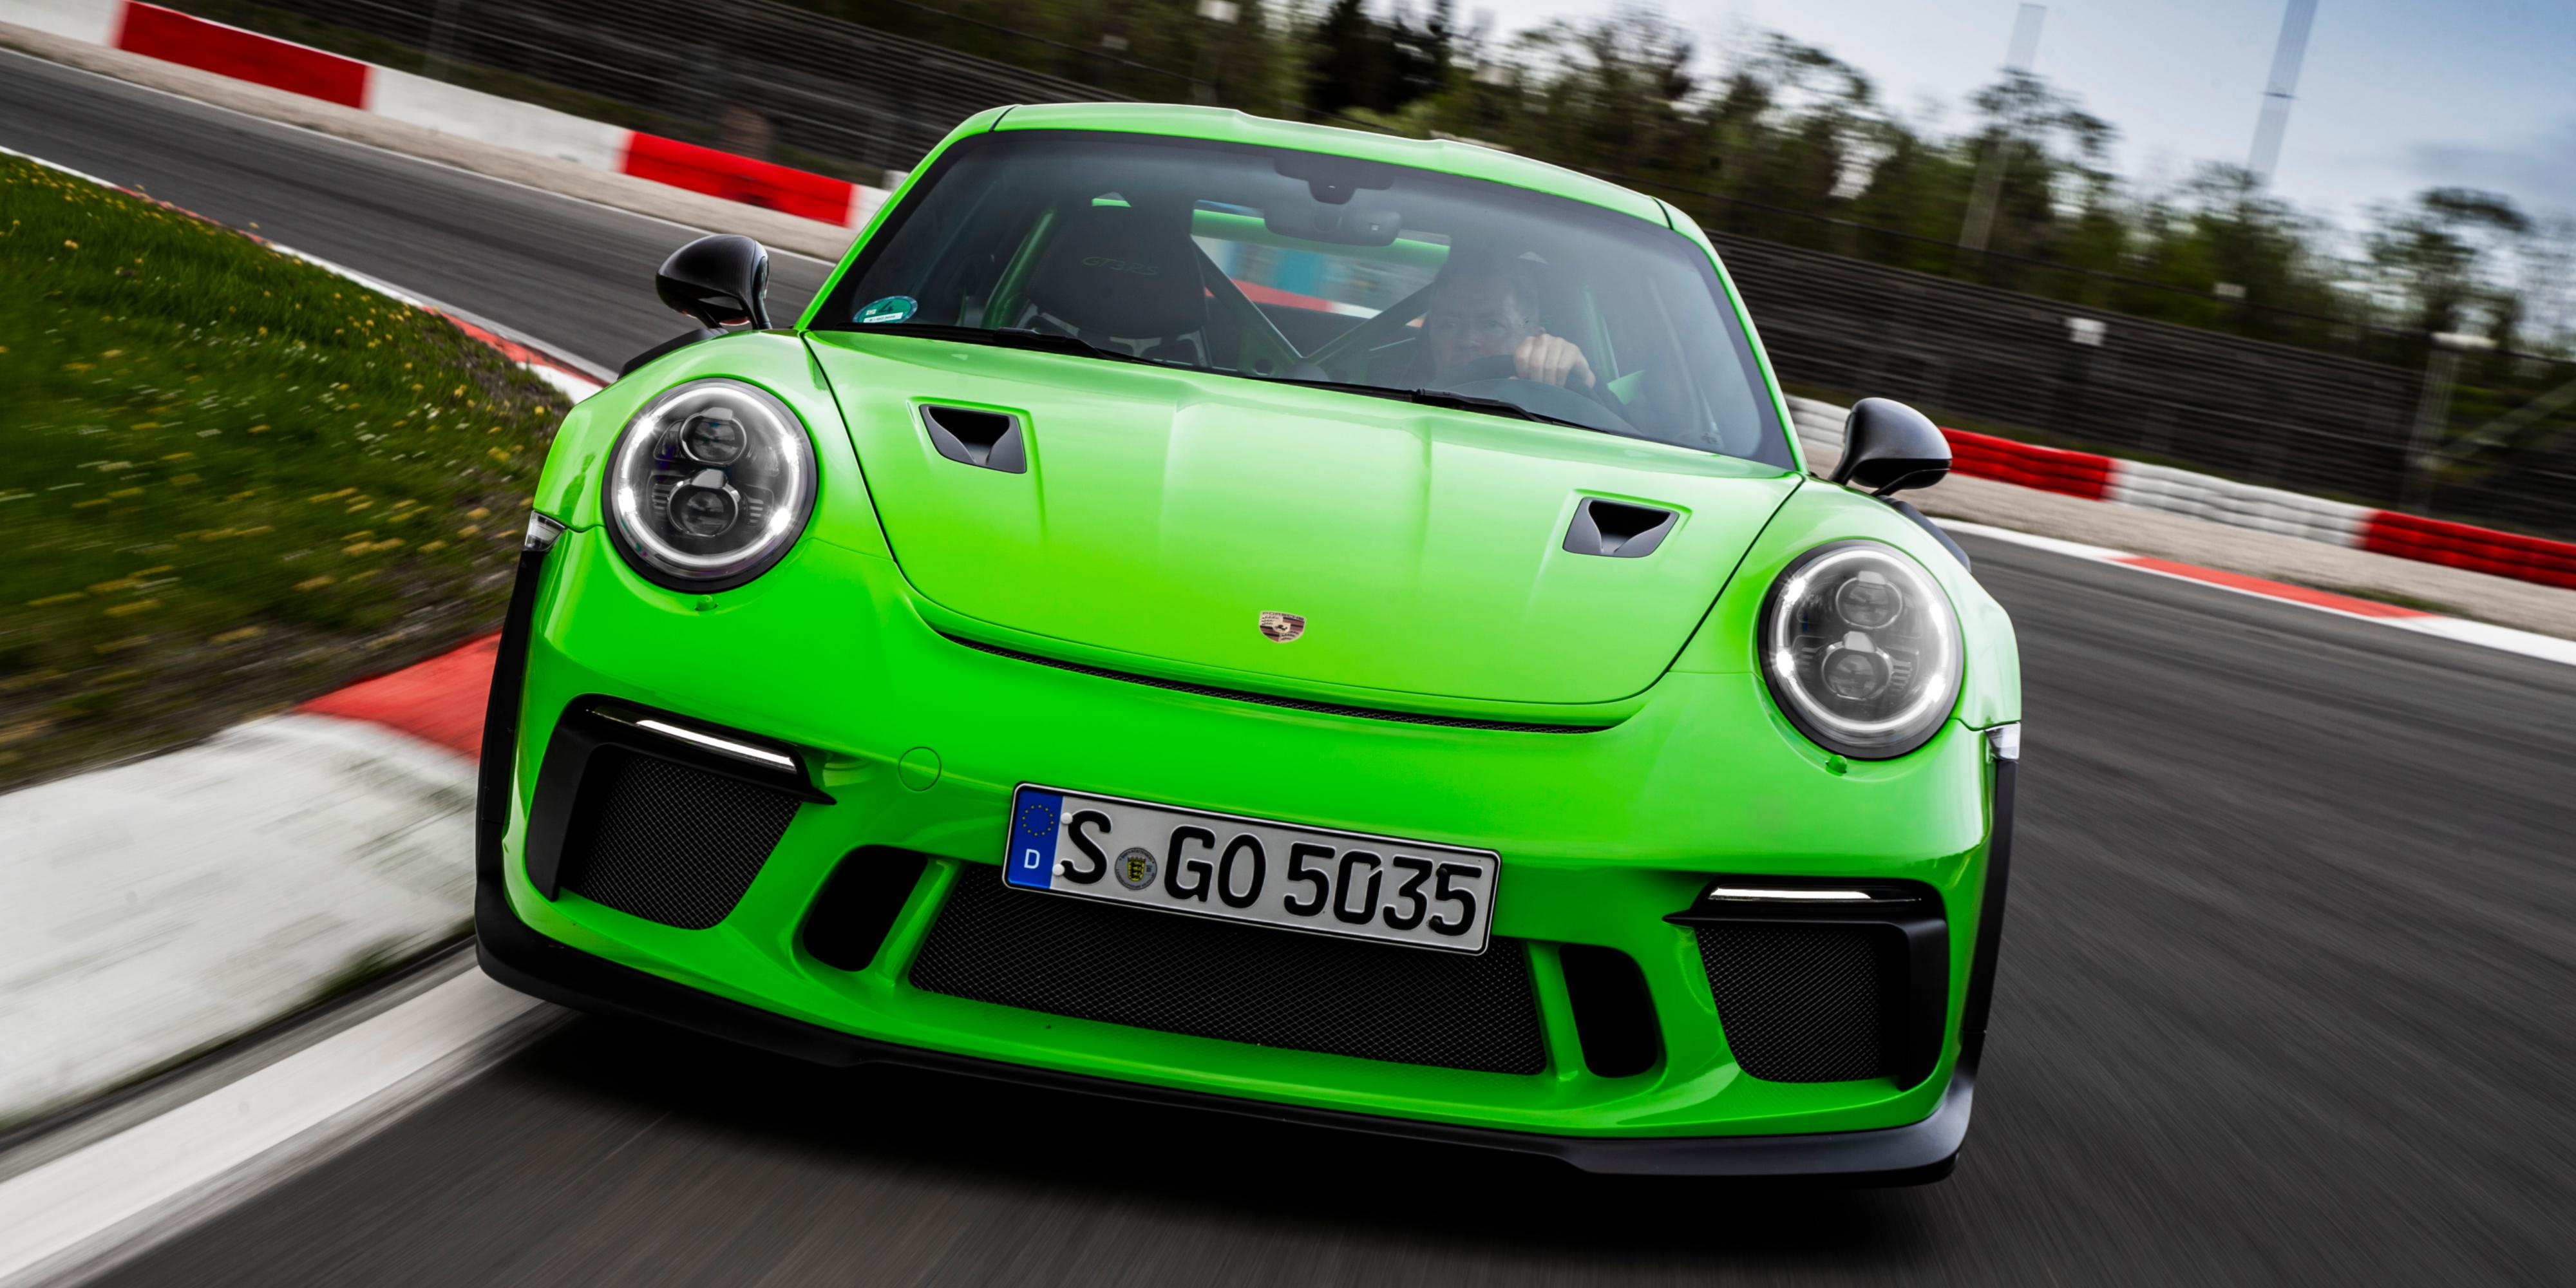 Porsche 911 Gt3 Rs The Sound Of Violence